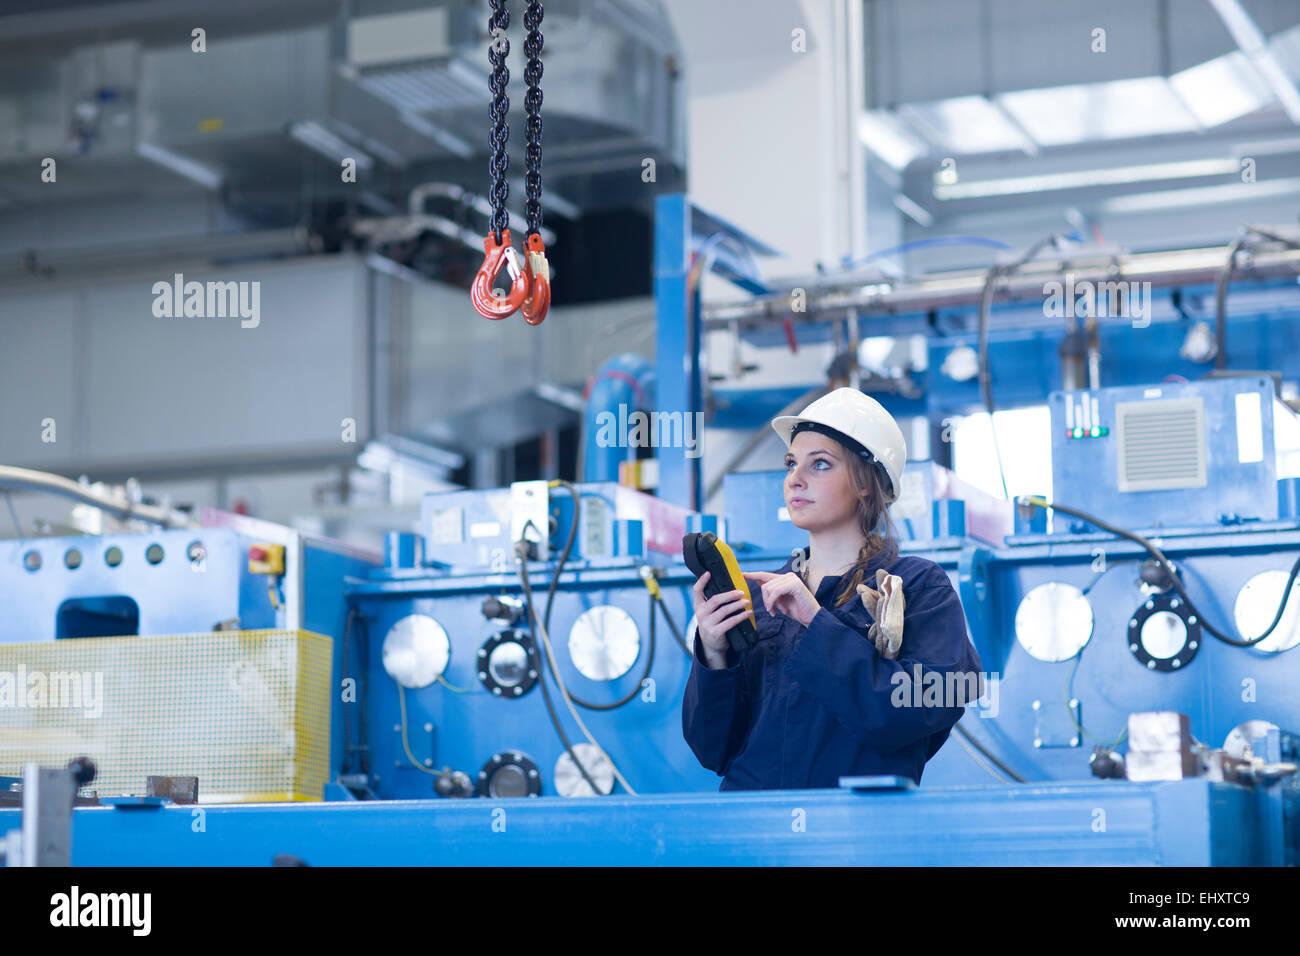 Technician in factory hall using regulator for hook - Stock Image